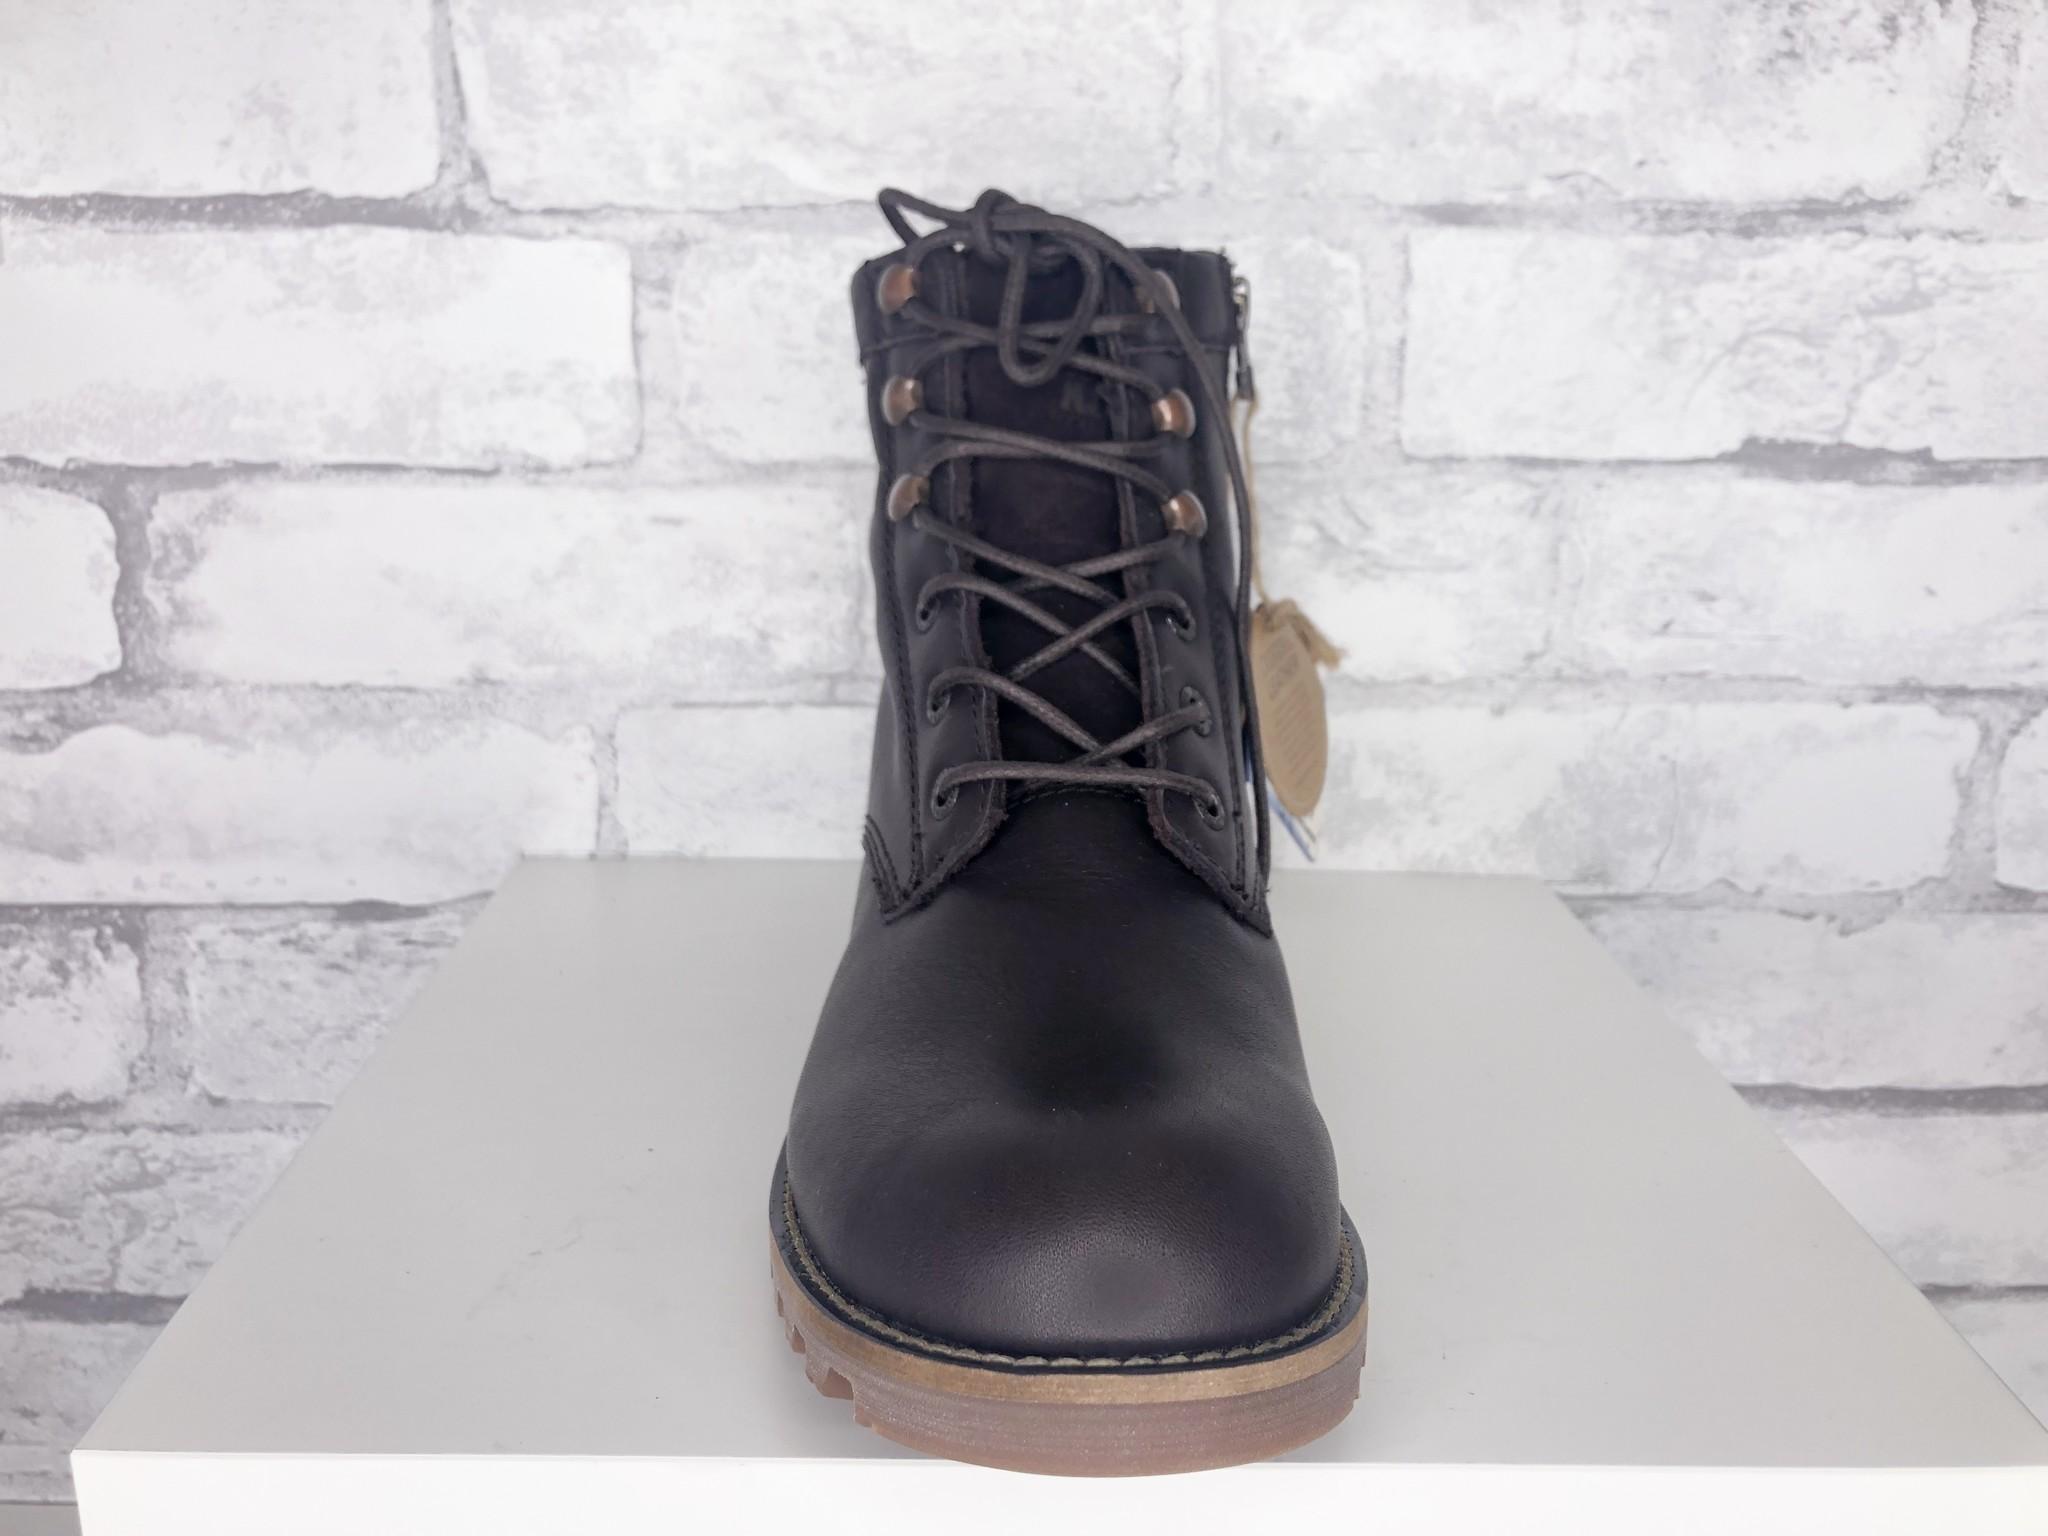 Kodiak Boots Mahone Eggplant